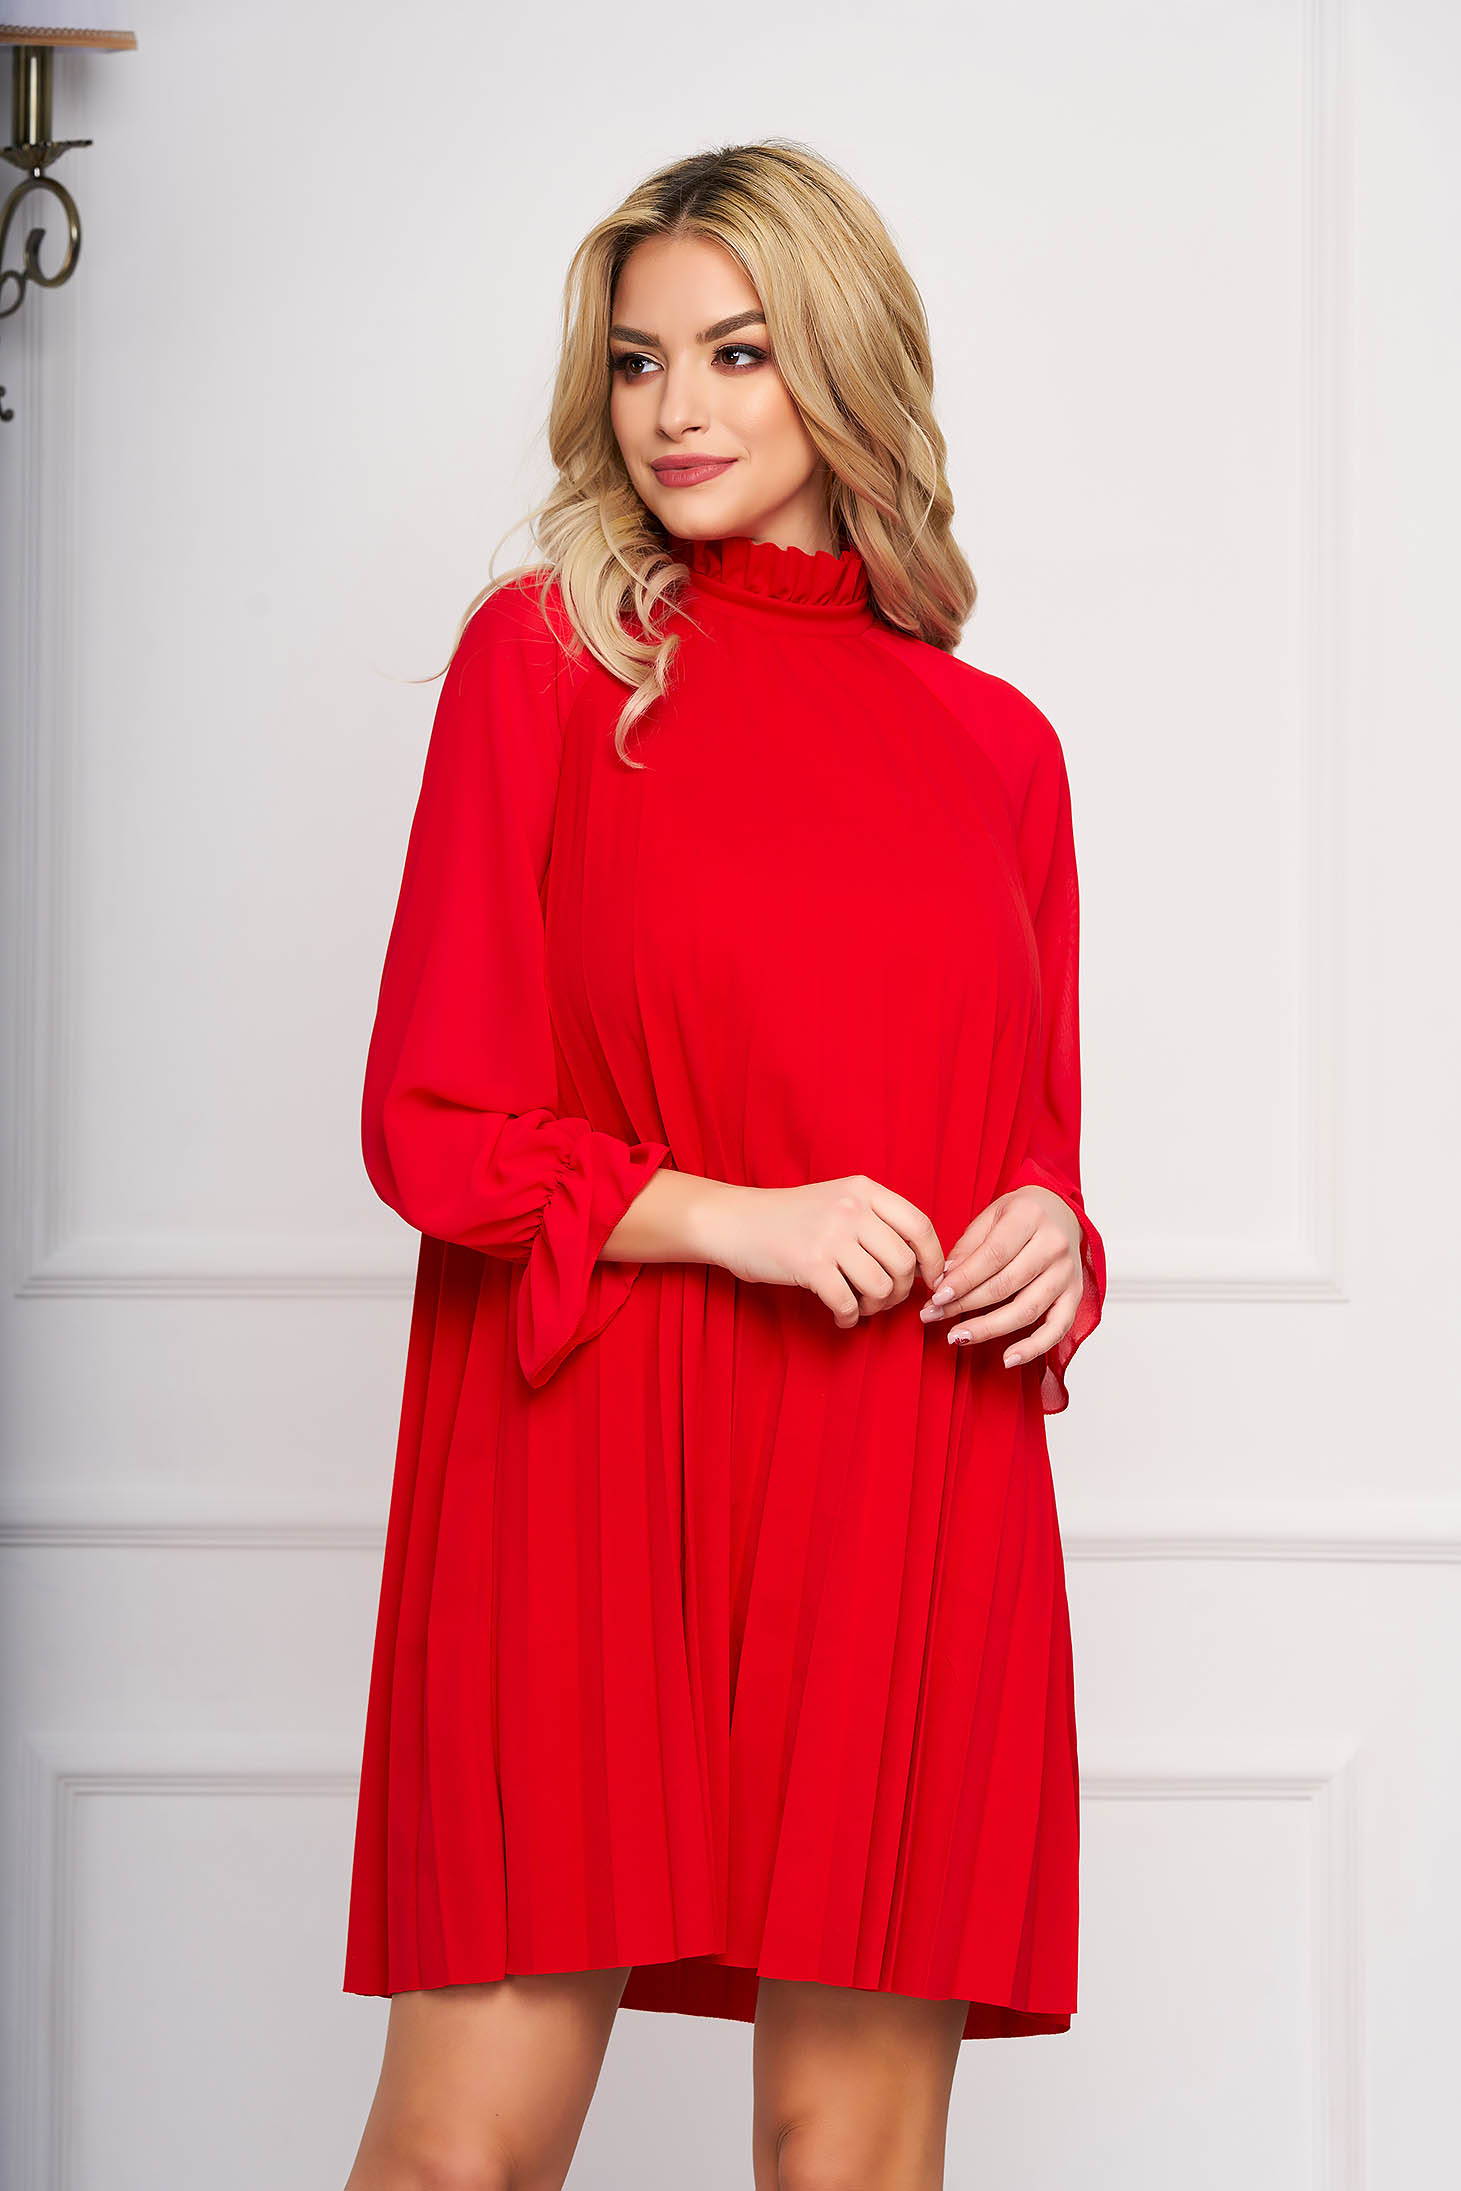 Red dress elegant short cut from veil fabric a-line long sleeved